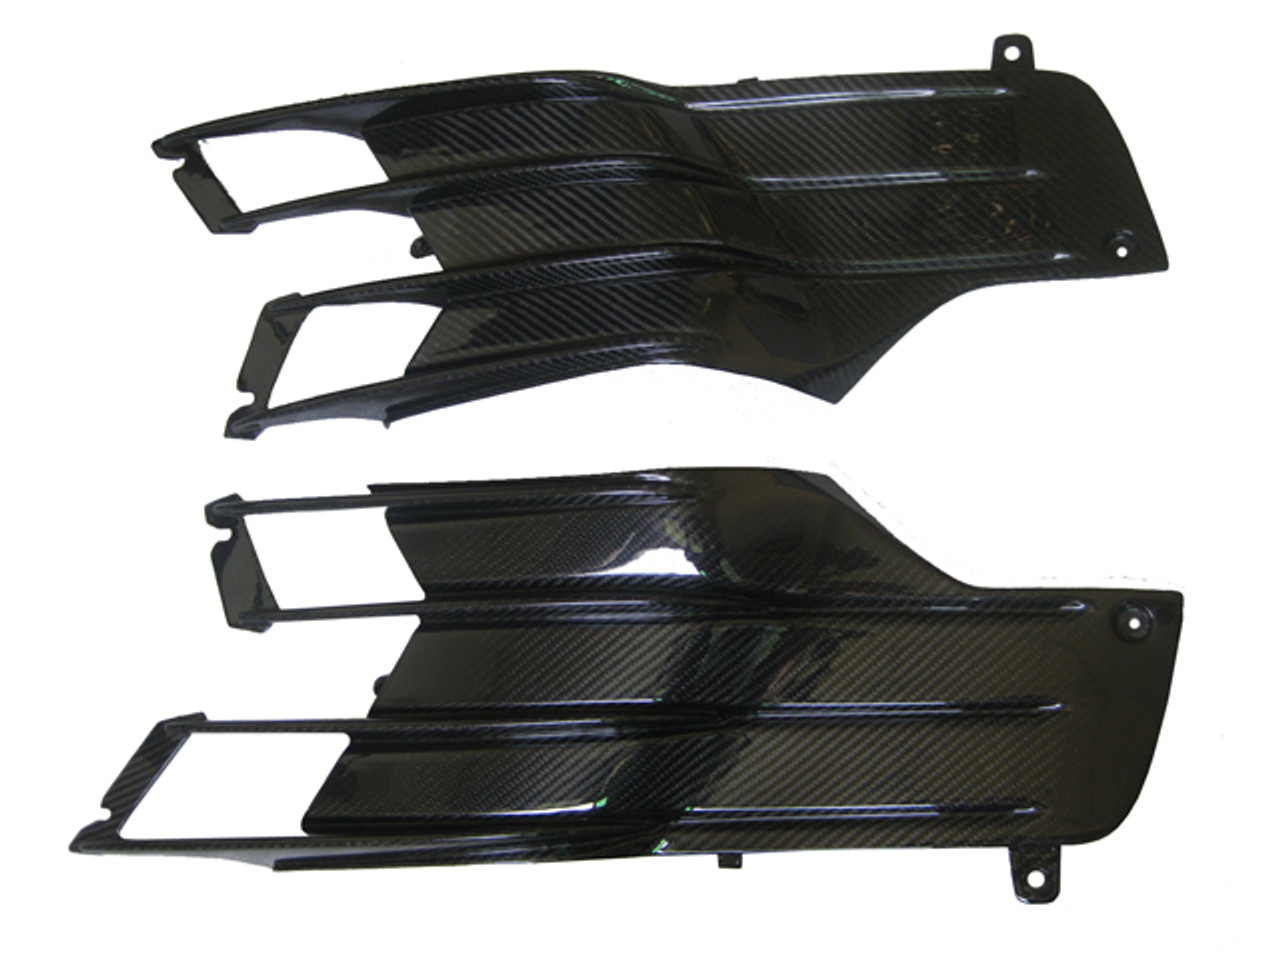 Glossy Twill Weave Carbon Fiber Under Tank Fittings for Kawasaki ZX14R/ZZR1400 2012+